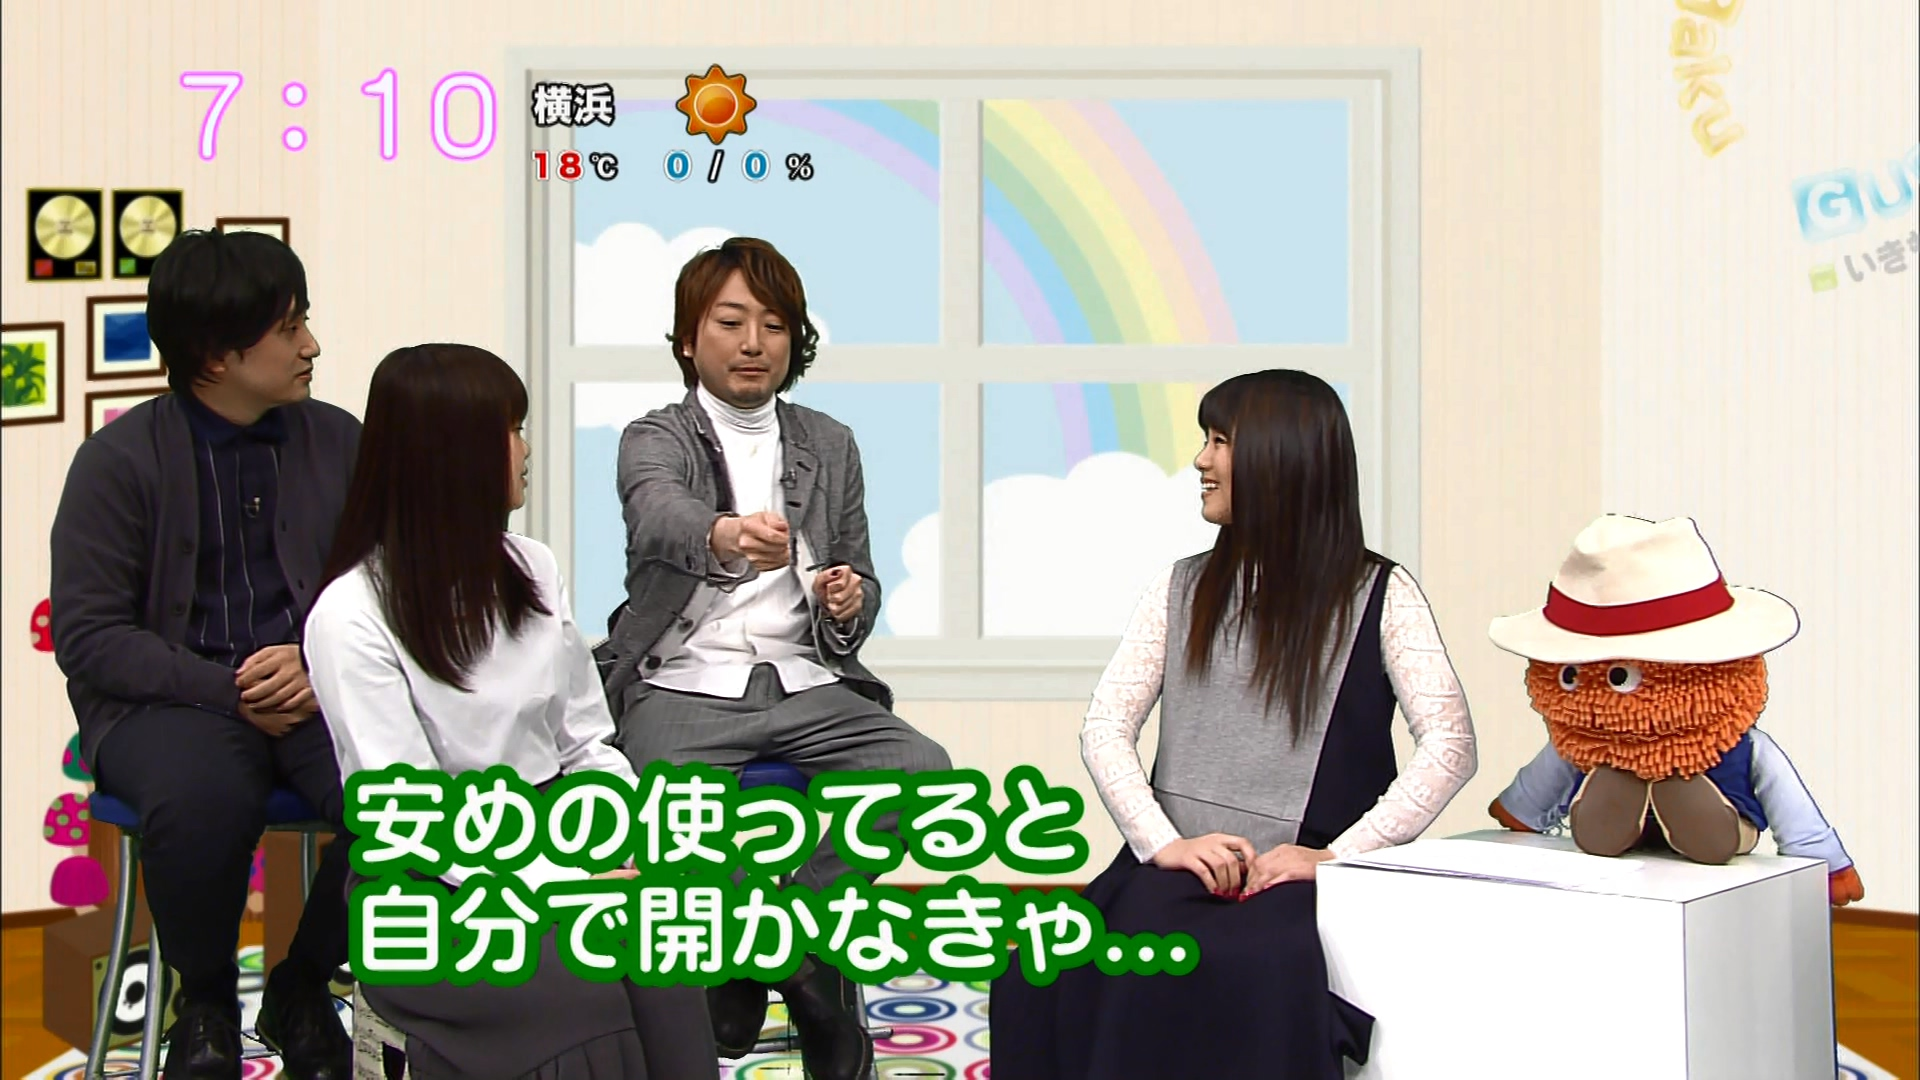 2016.03.17 いきものがかり(saku saku).ts_20160317_080853.313